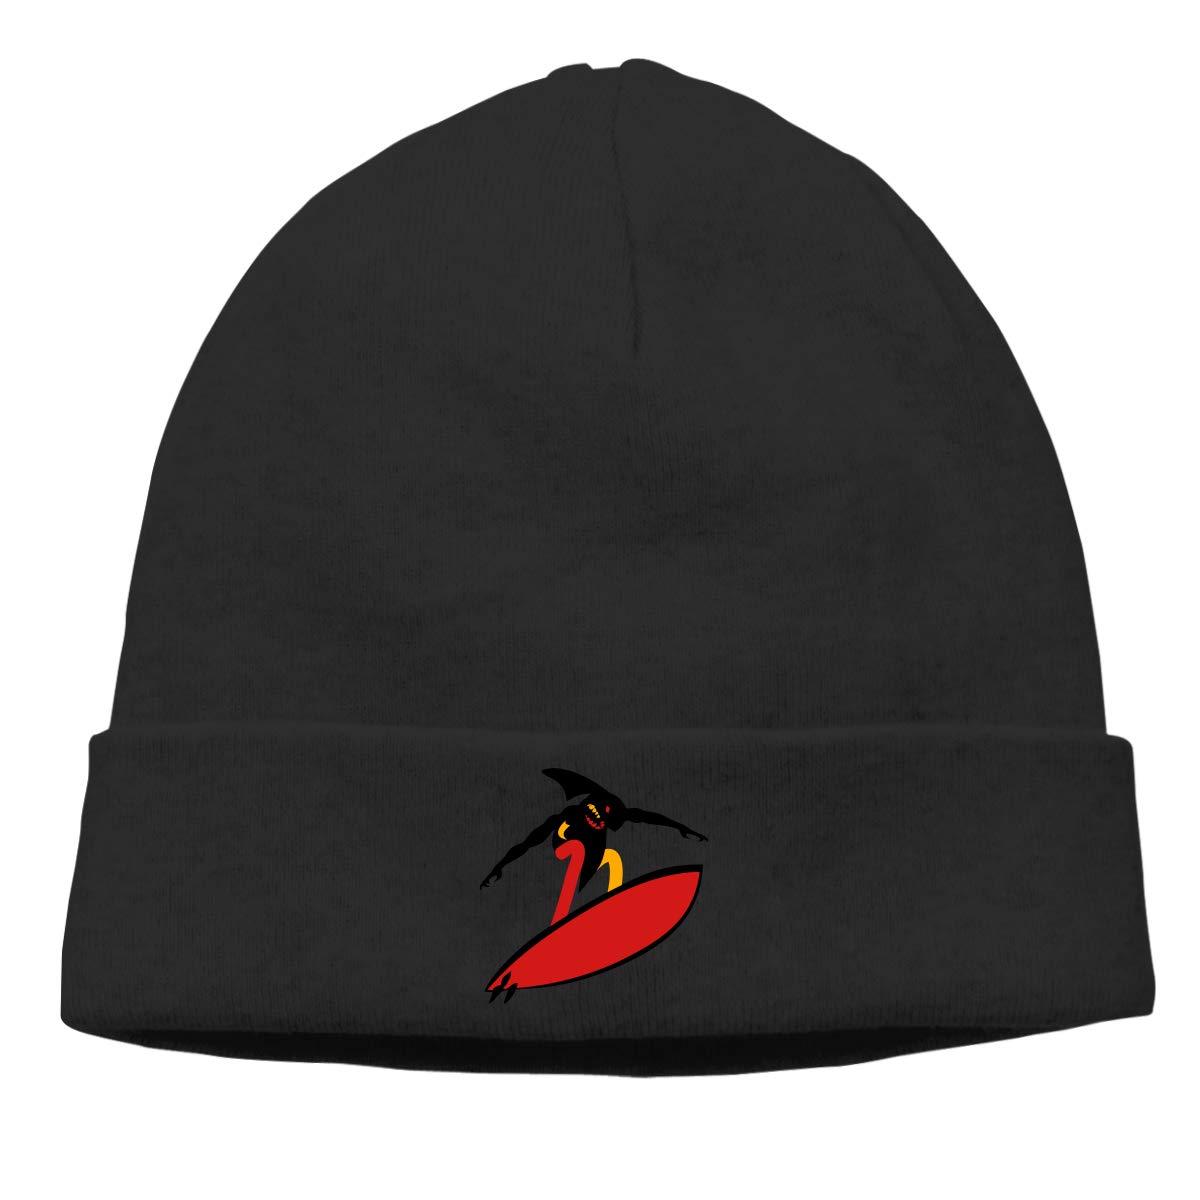 Shark Man Surf Cap Men Winter Summer Warm /& Stylish Slouch Beanie Hats Knit Cuff Beanie